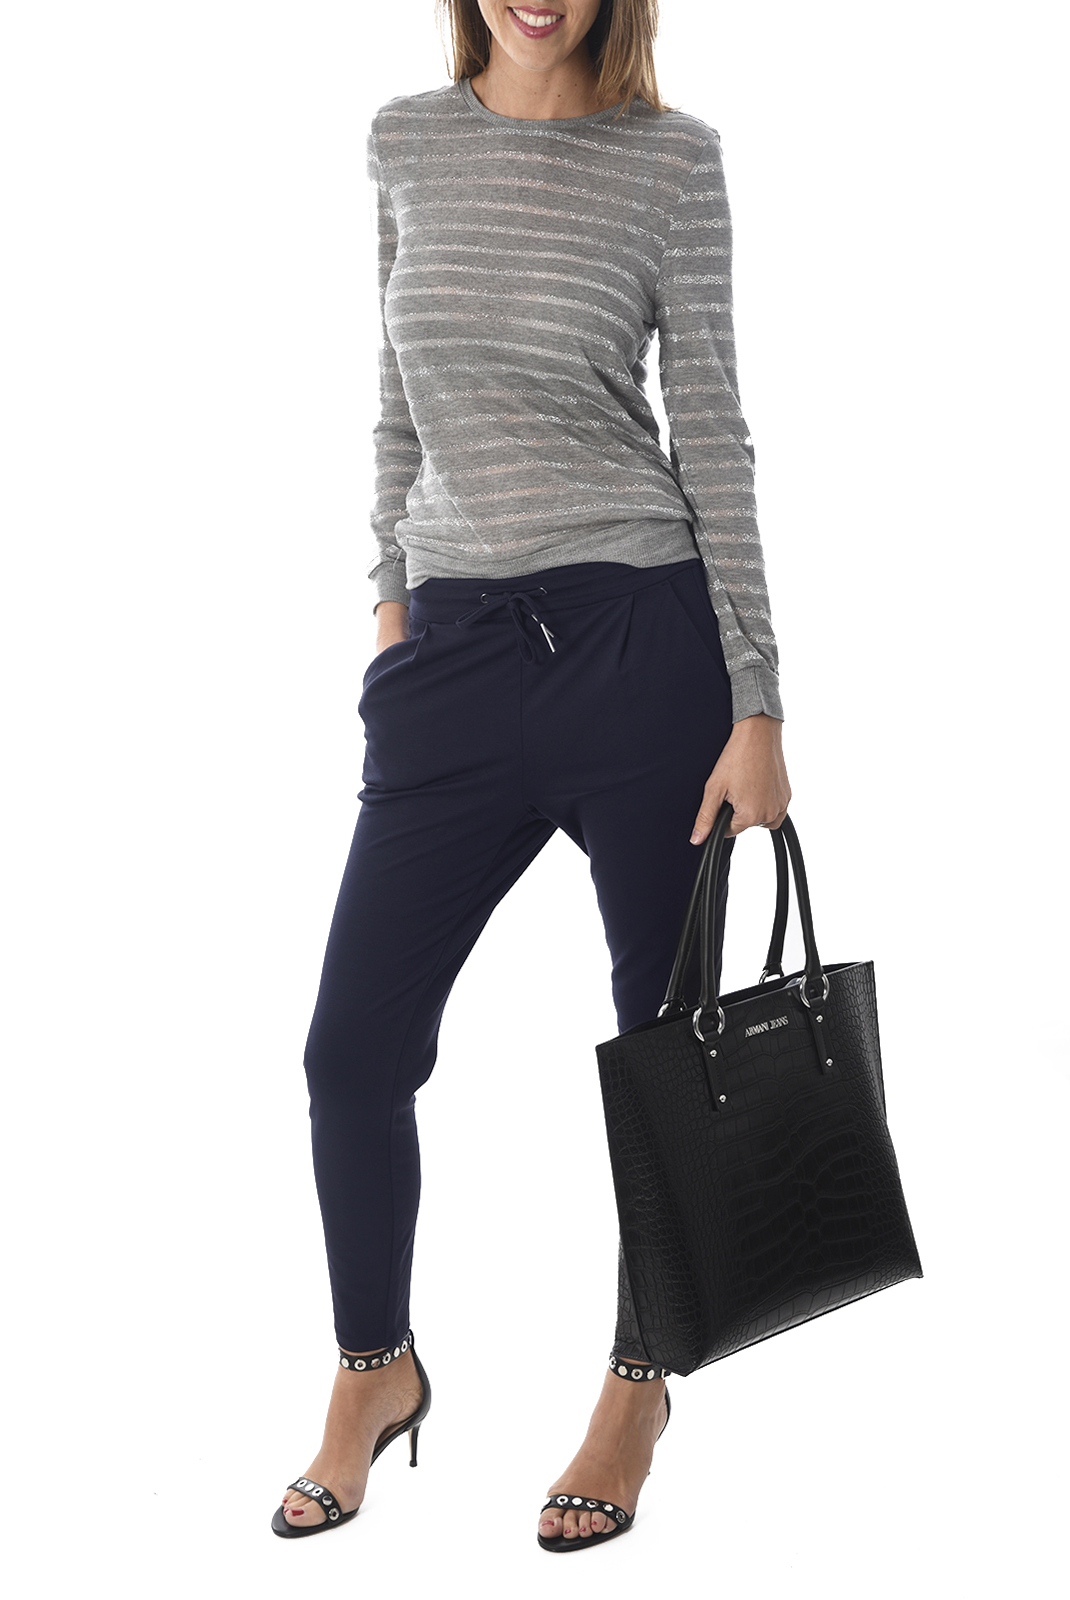 Cabas / Sacs shopping  Armani jeans 922145 6A711 020 BLACK